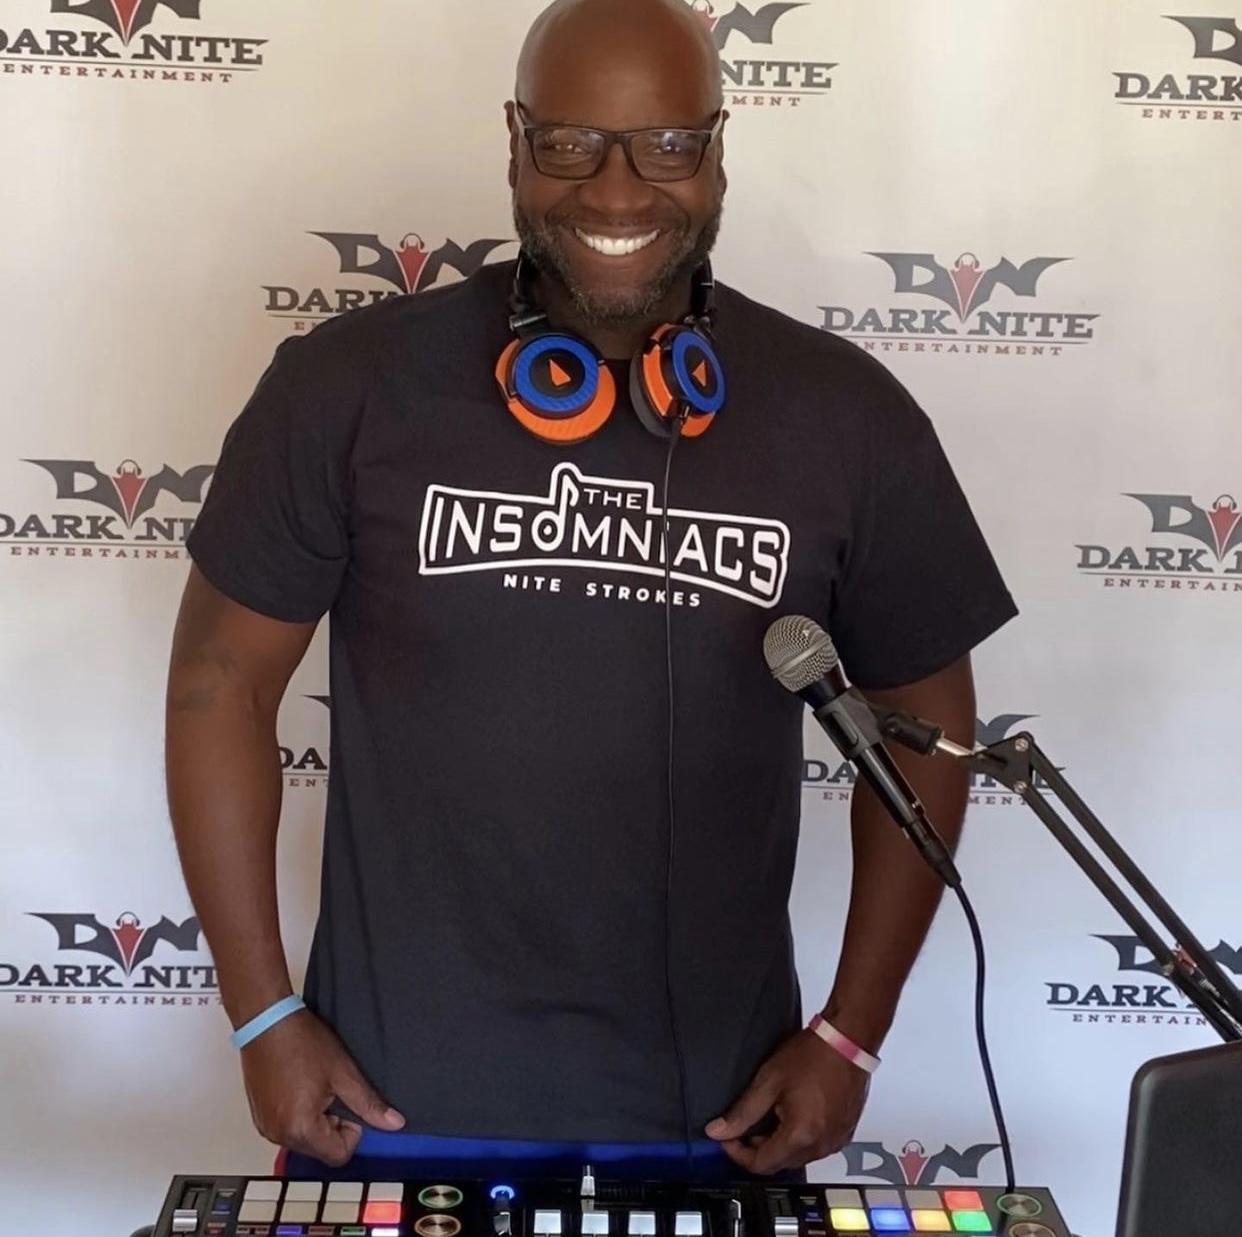 DJ Darknite